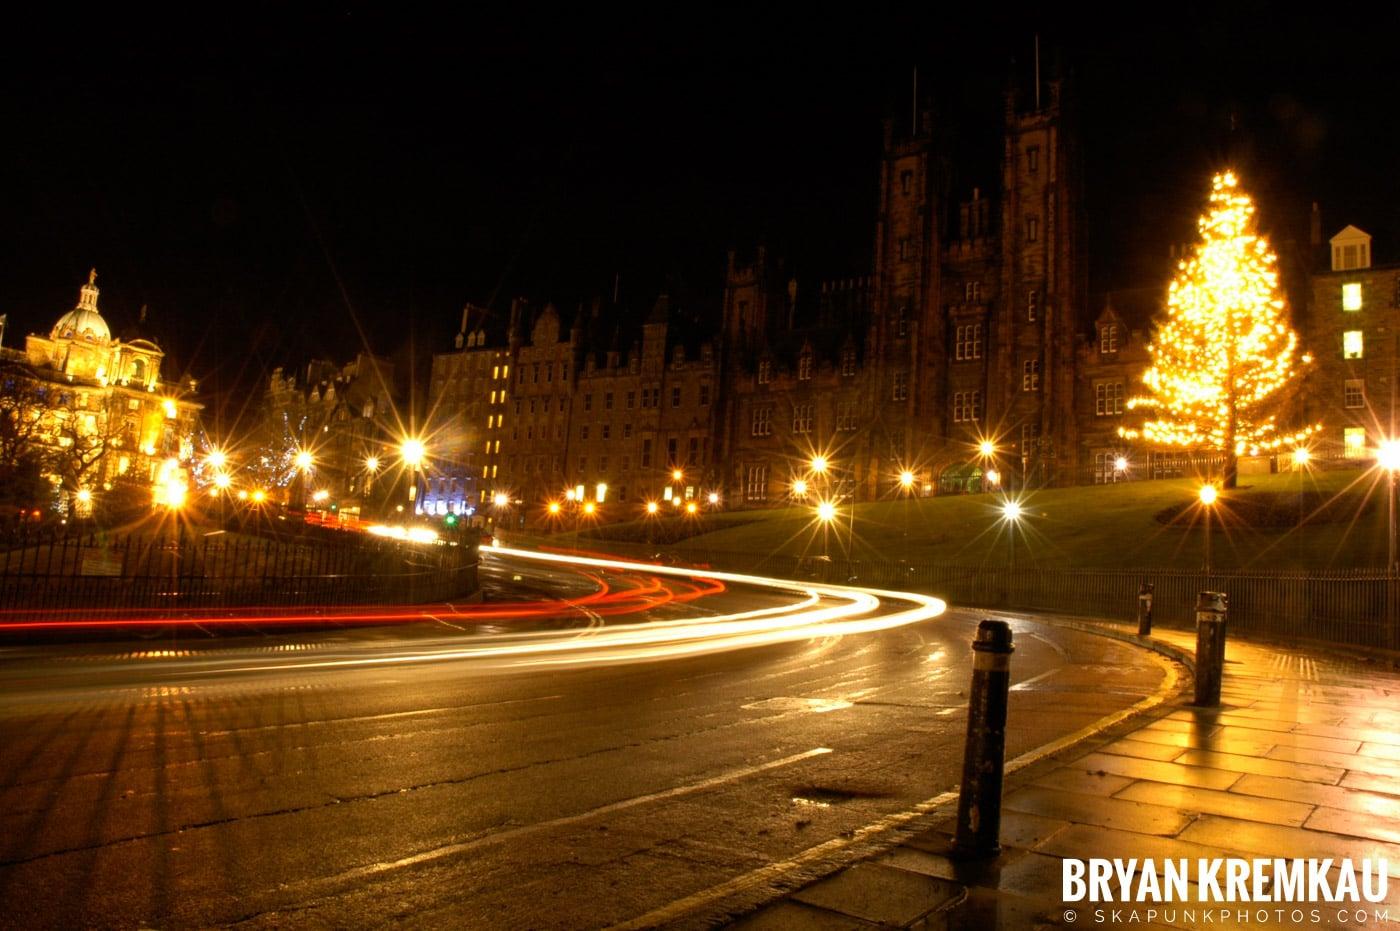 Edinburgh, Scotland - Day 1 - 12.12.06 (10)